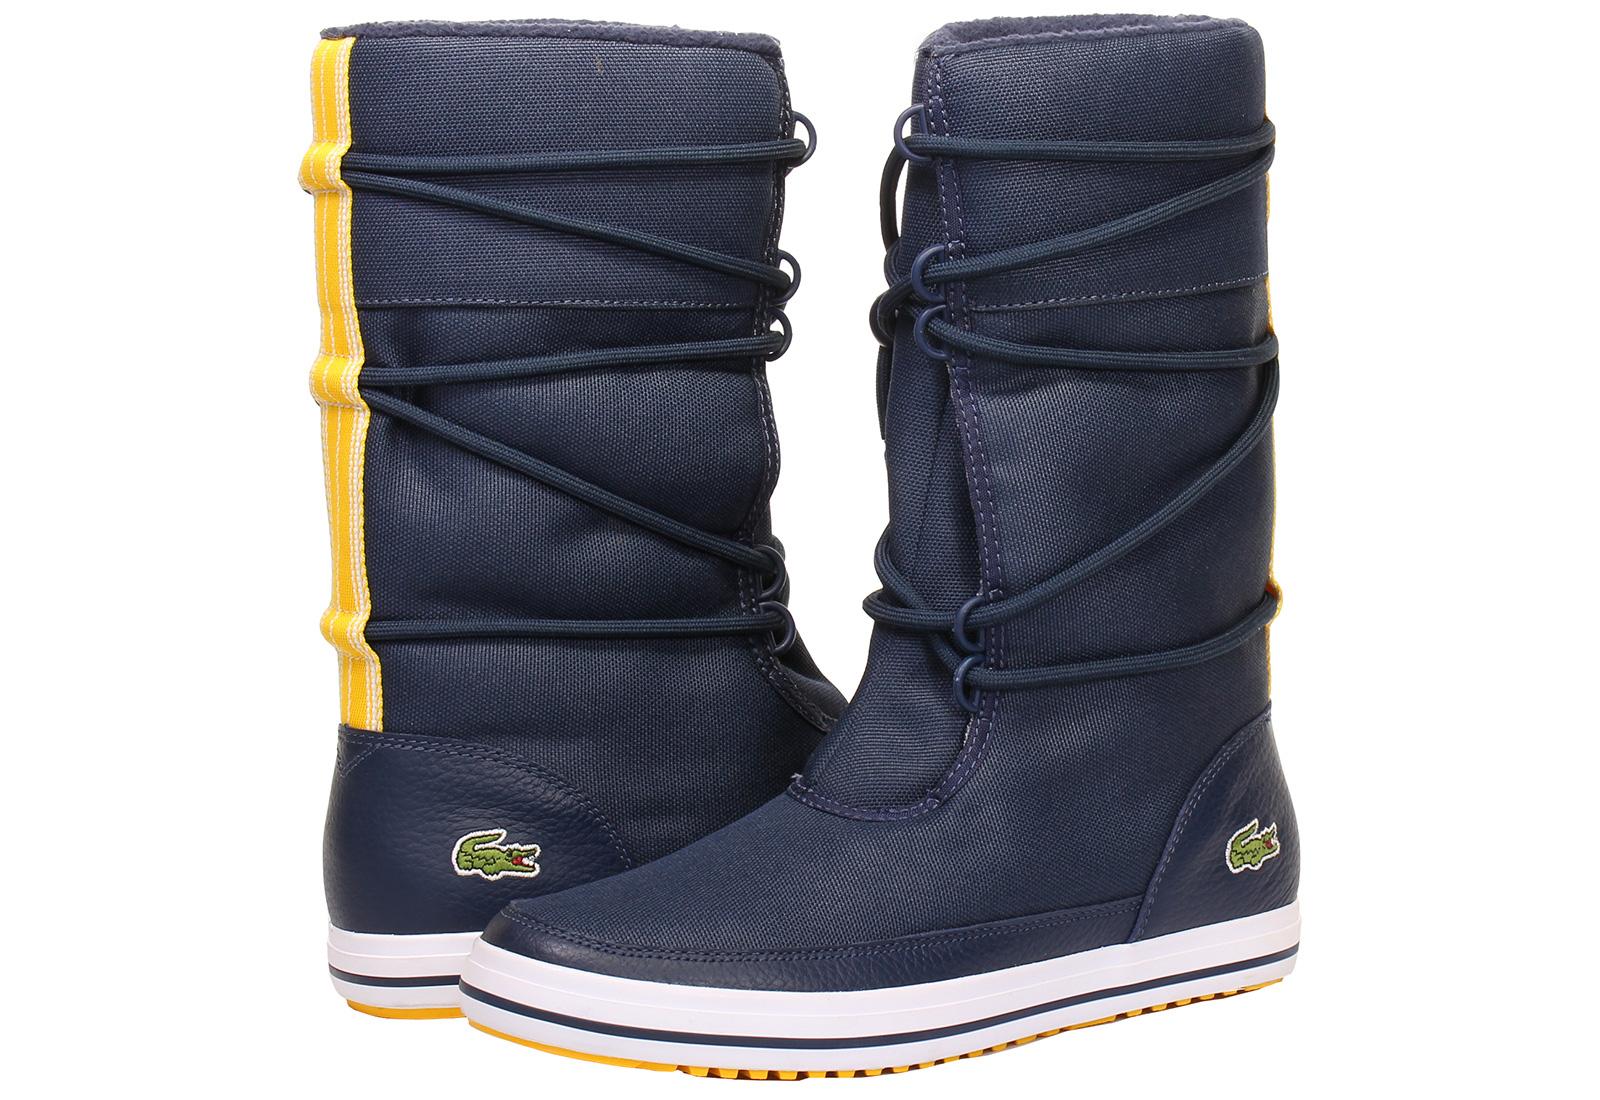 Lacoste Csizma - Torrino - 133spw1022-250 - Office Shoes Magyarország 765a377f1f